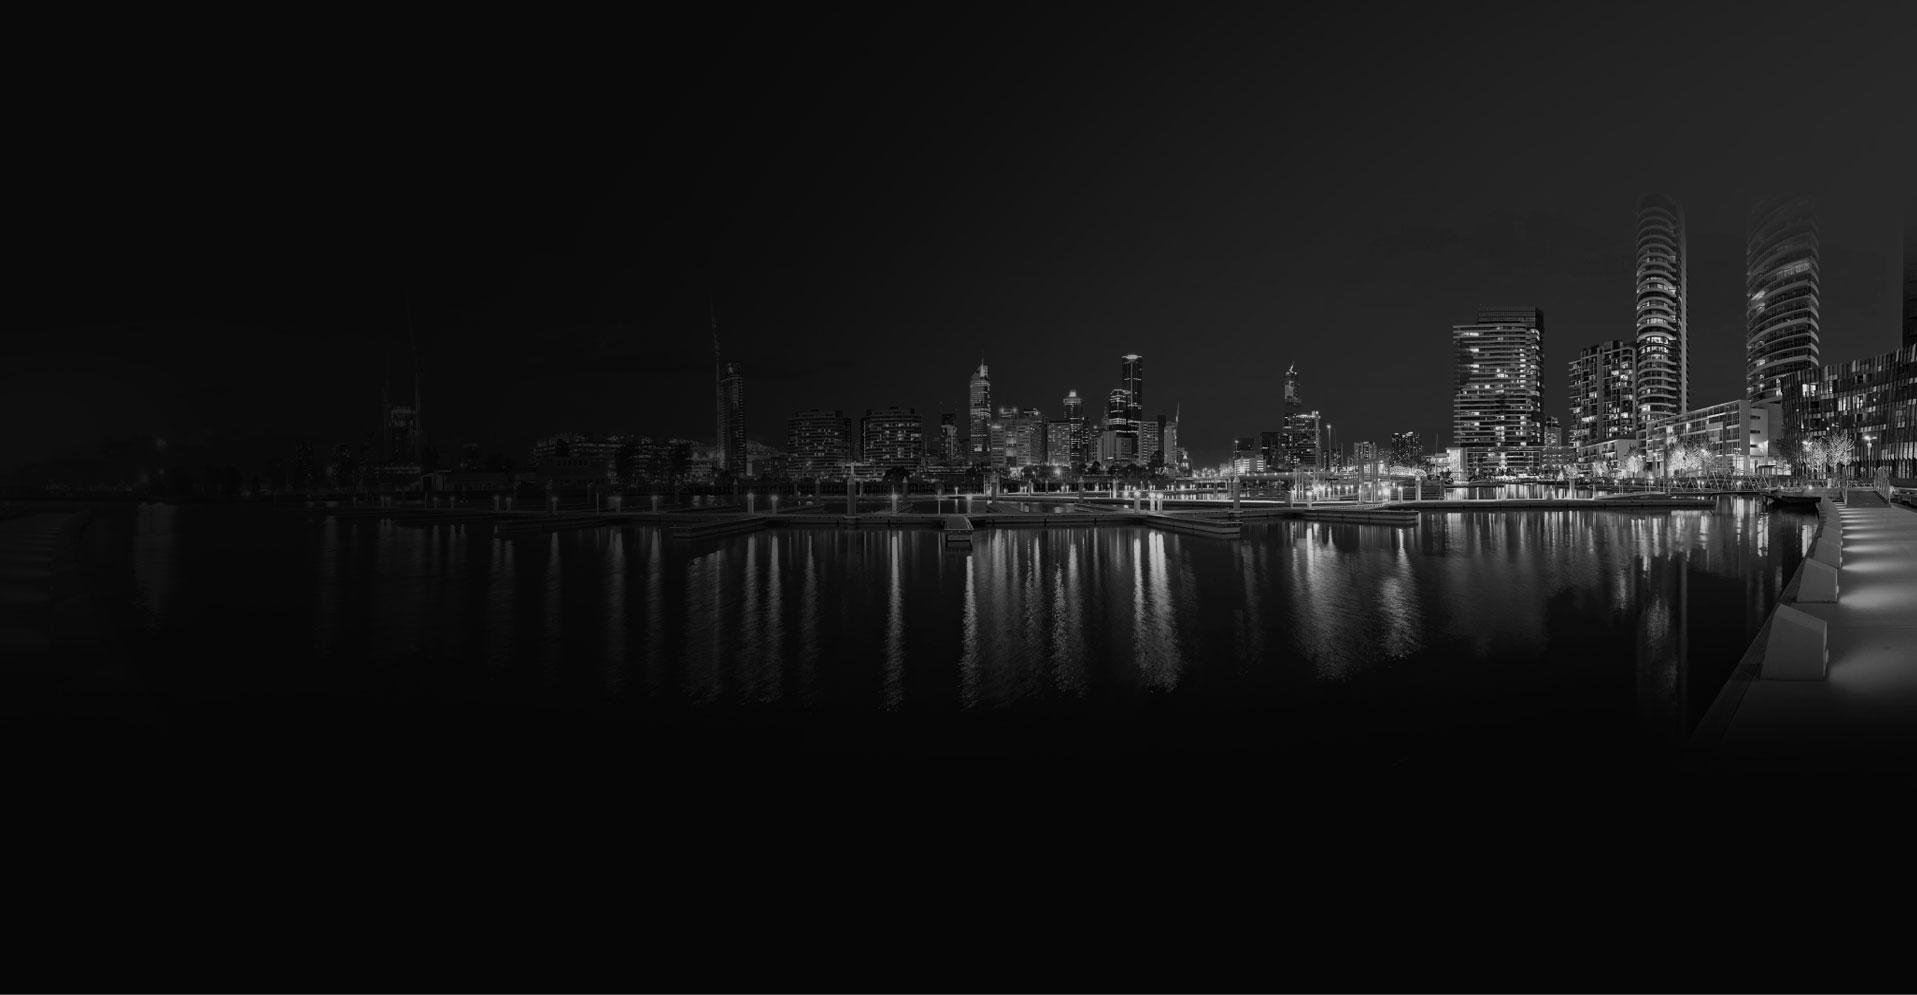 bw-city